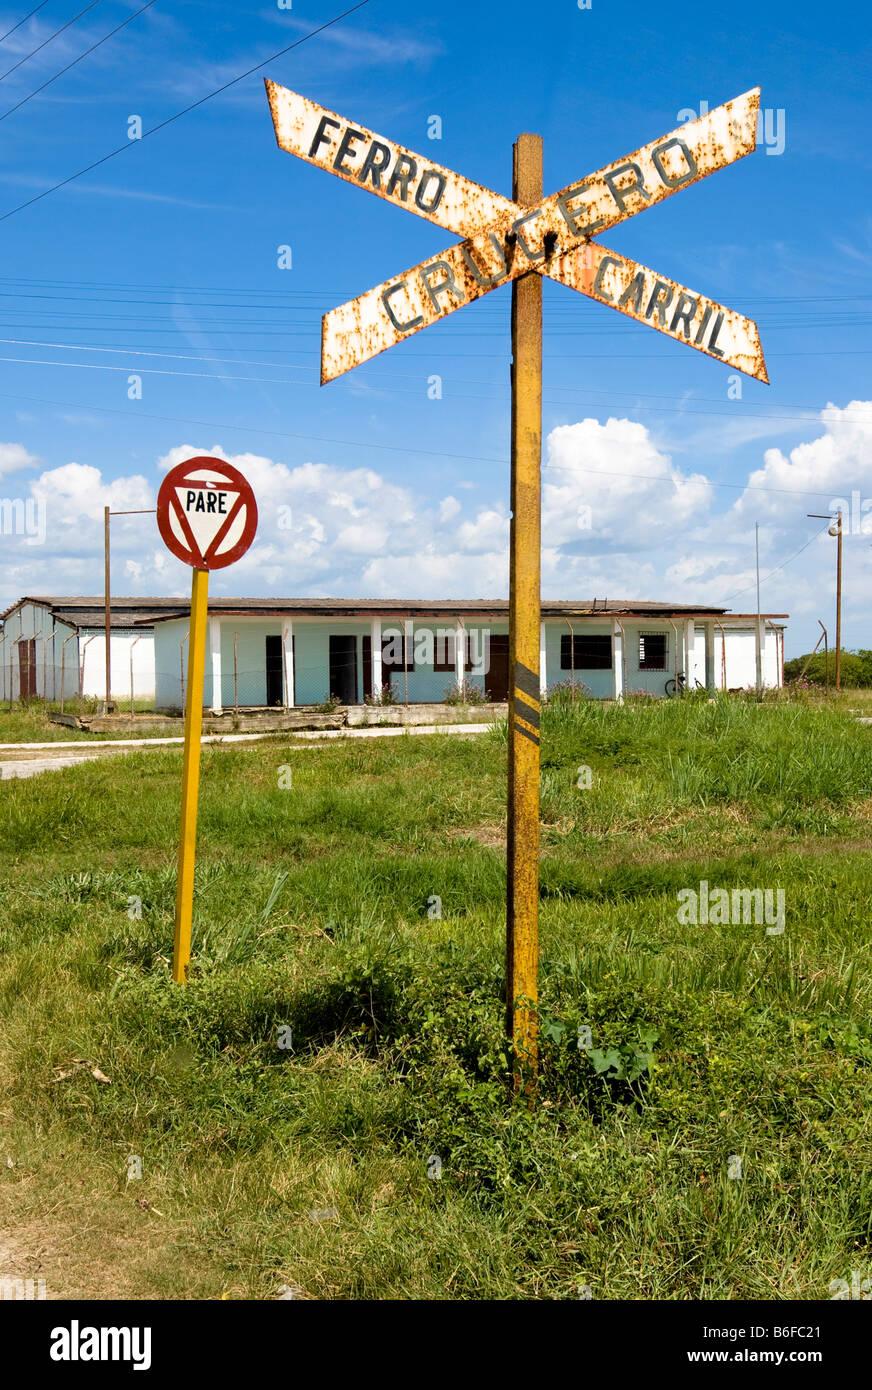 Warning sign for crossing the railway track, Sancti-Spíritus province, Cuba, Latin America Stock Photo